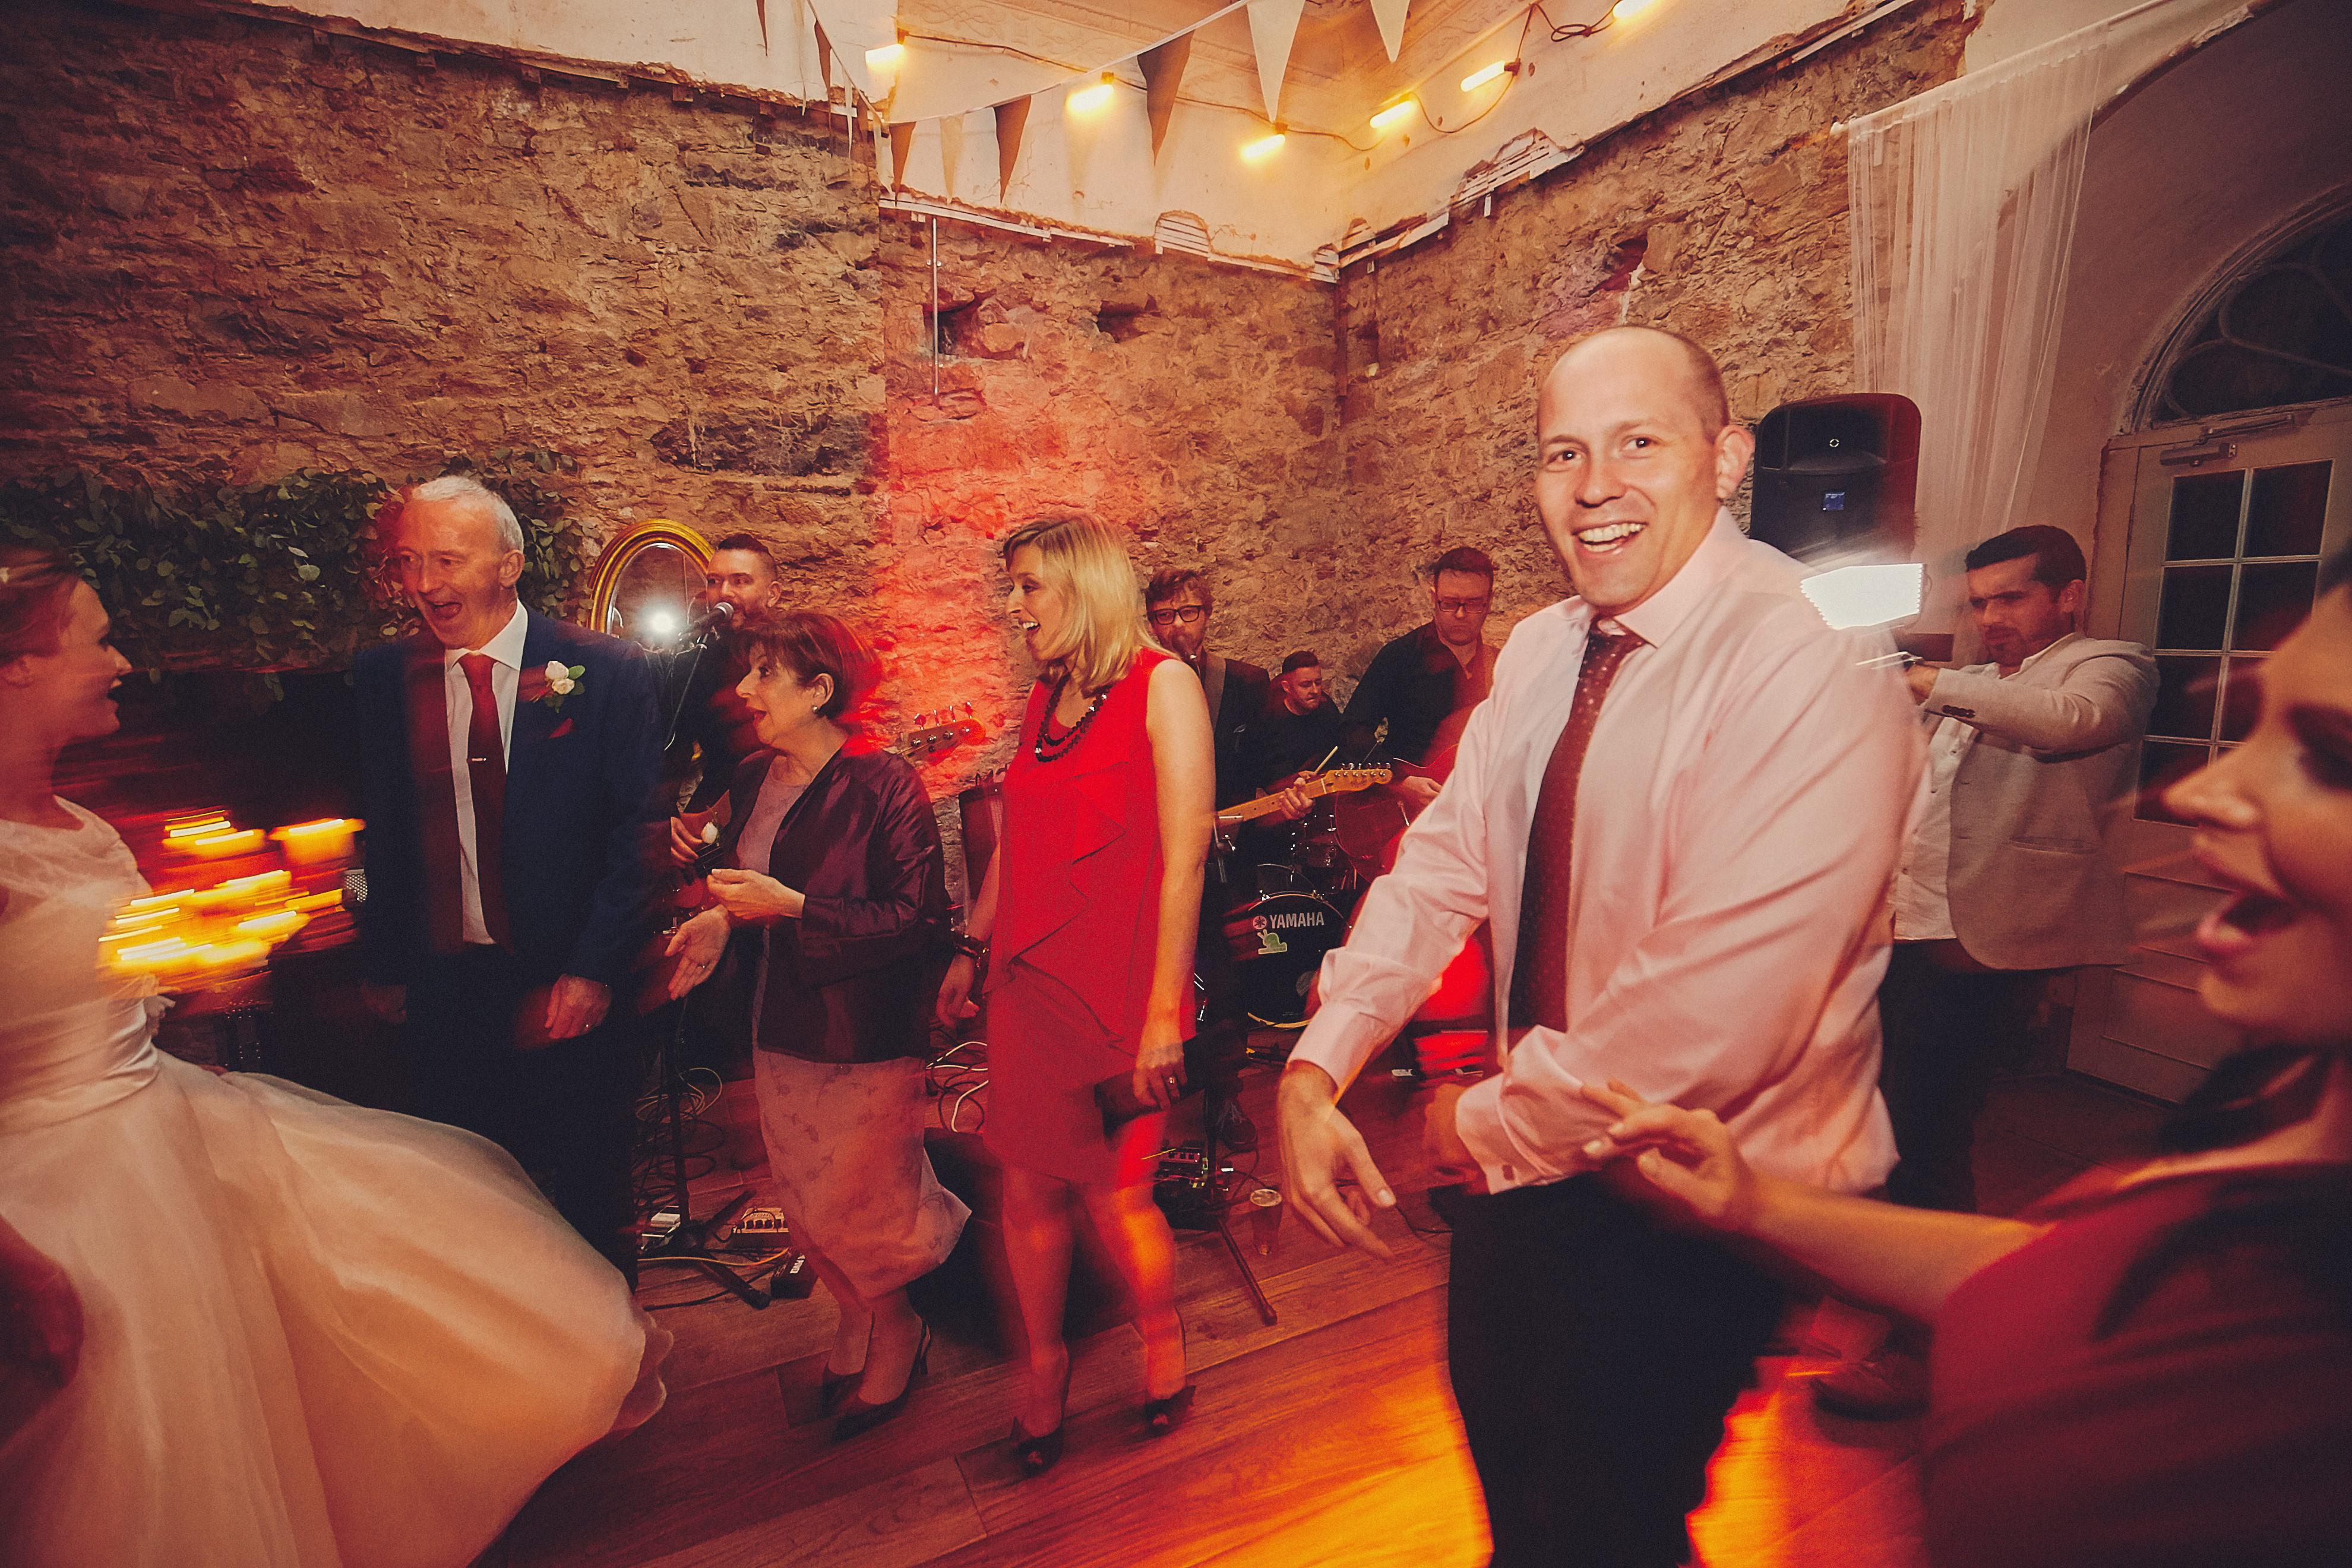 Cloughjordan House weddding159 - Cloughjordan House Wedding - Alternative Venue